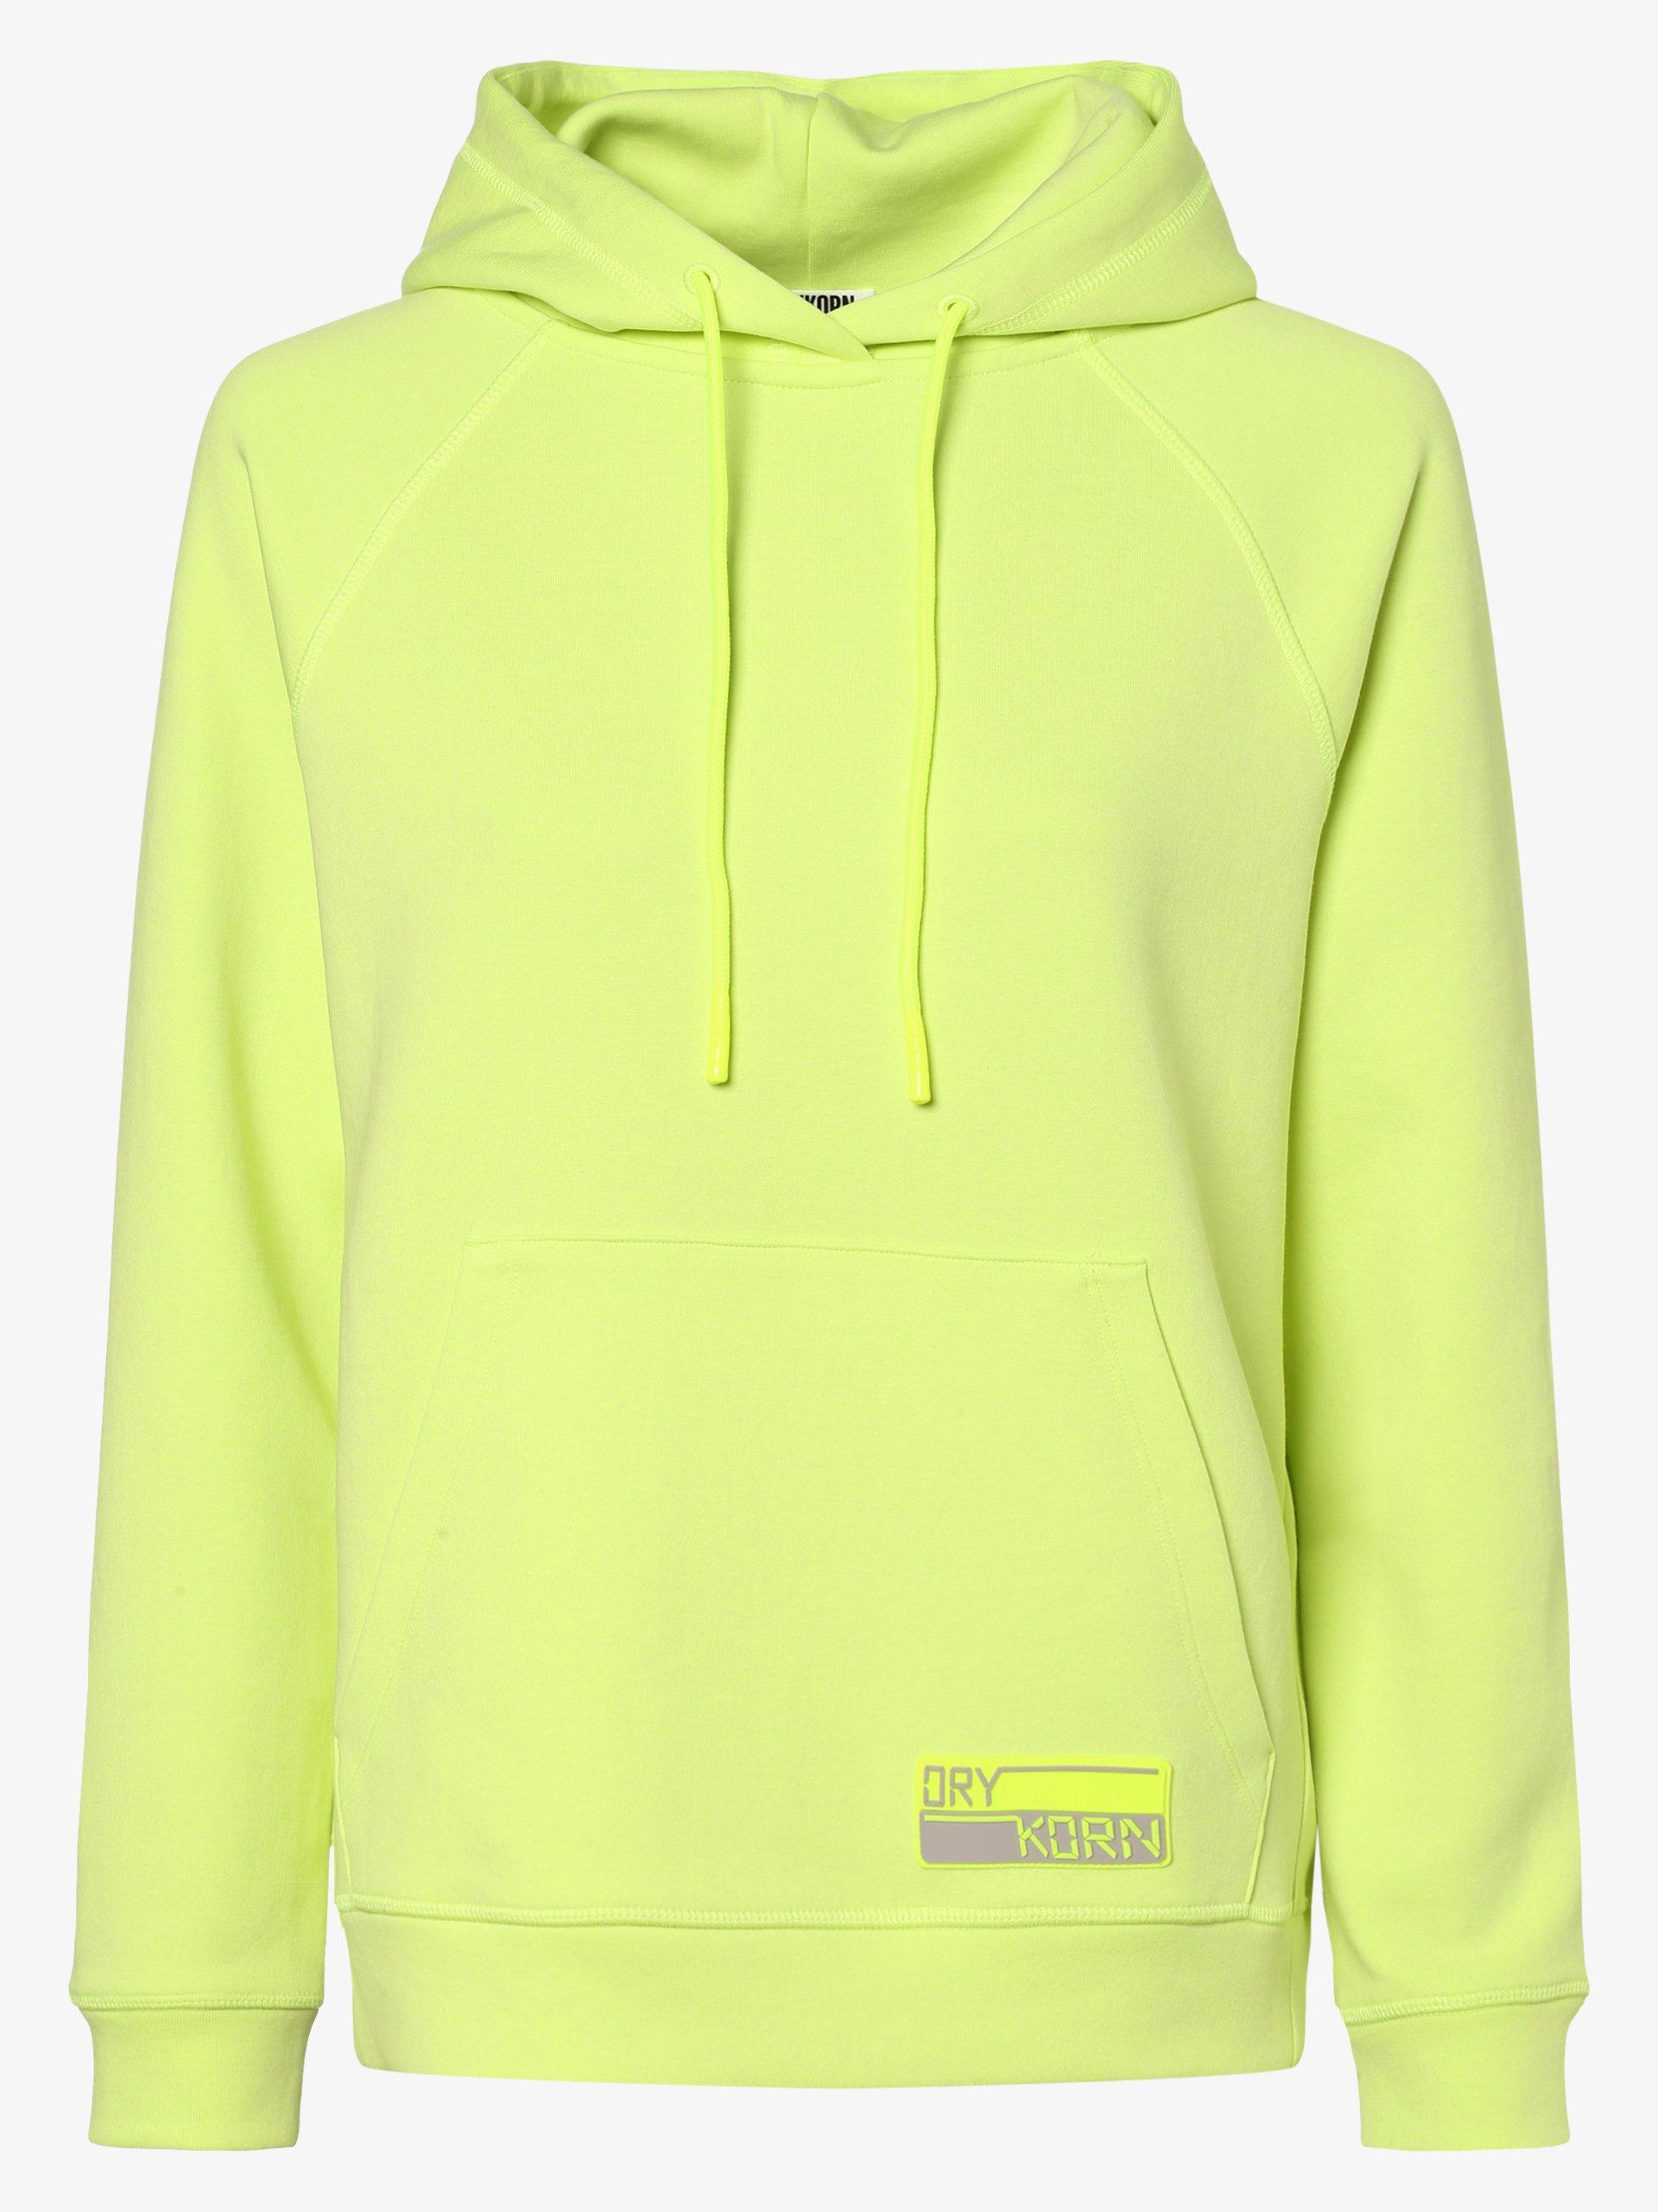 Drykorn Damen Sweatshirt - Emie_P2